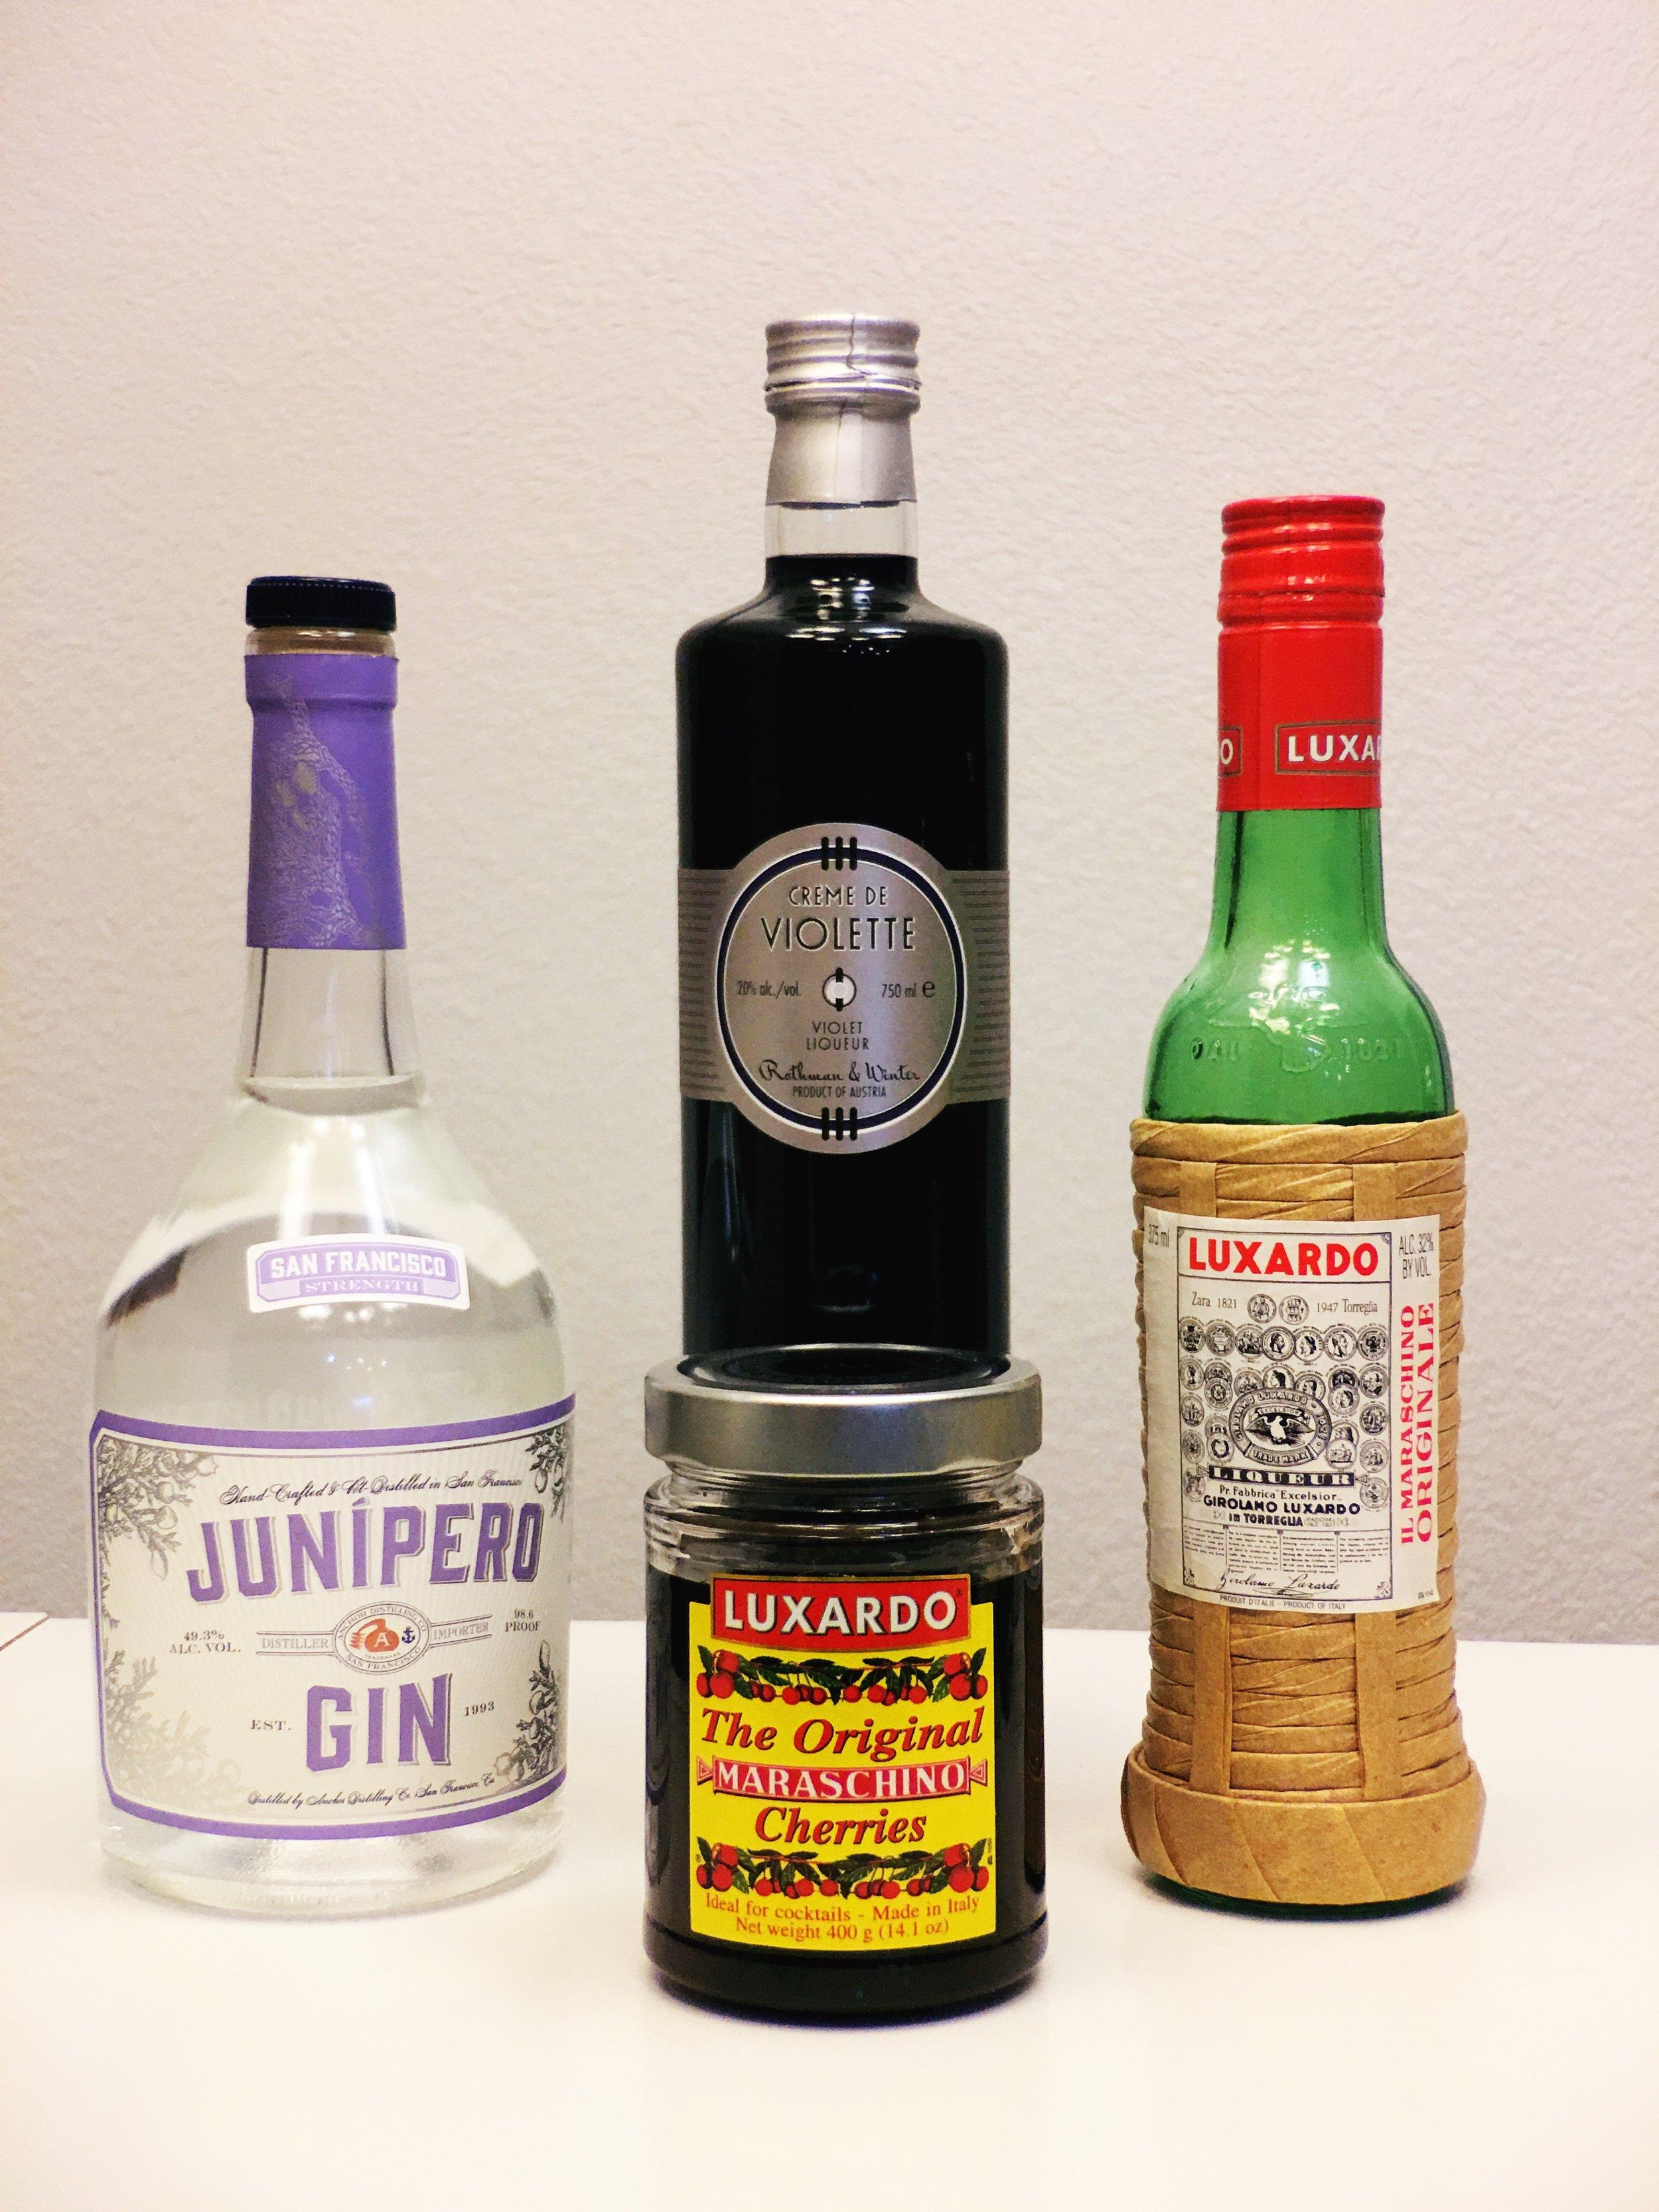 Gin, Luxardo Cherries and Creme De Violet